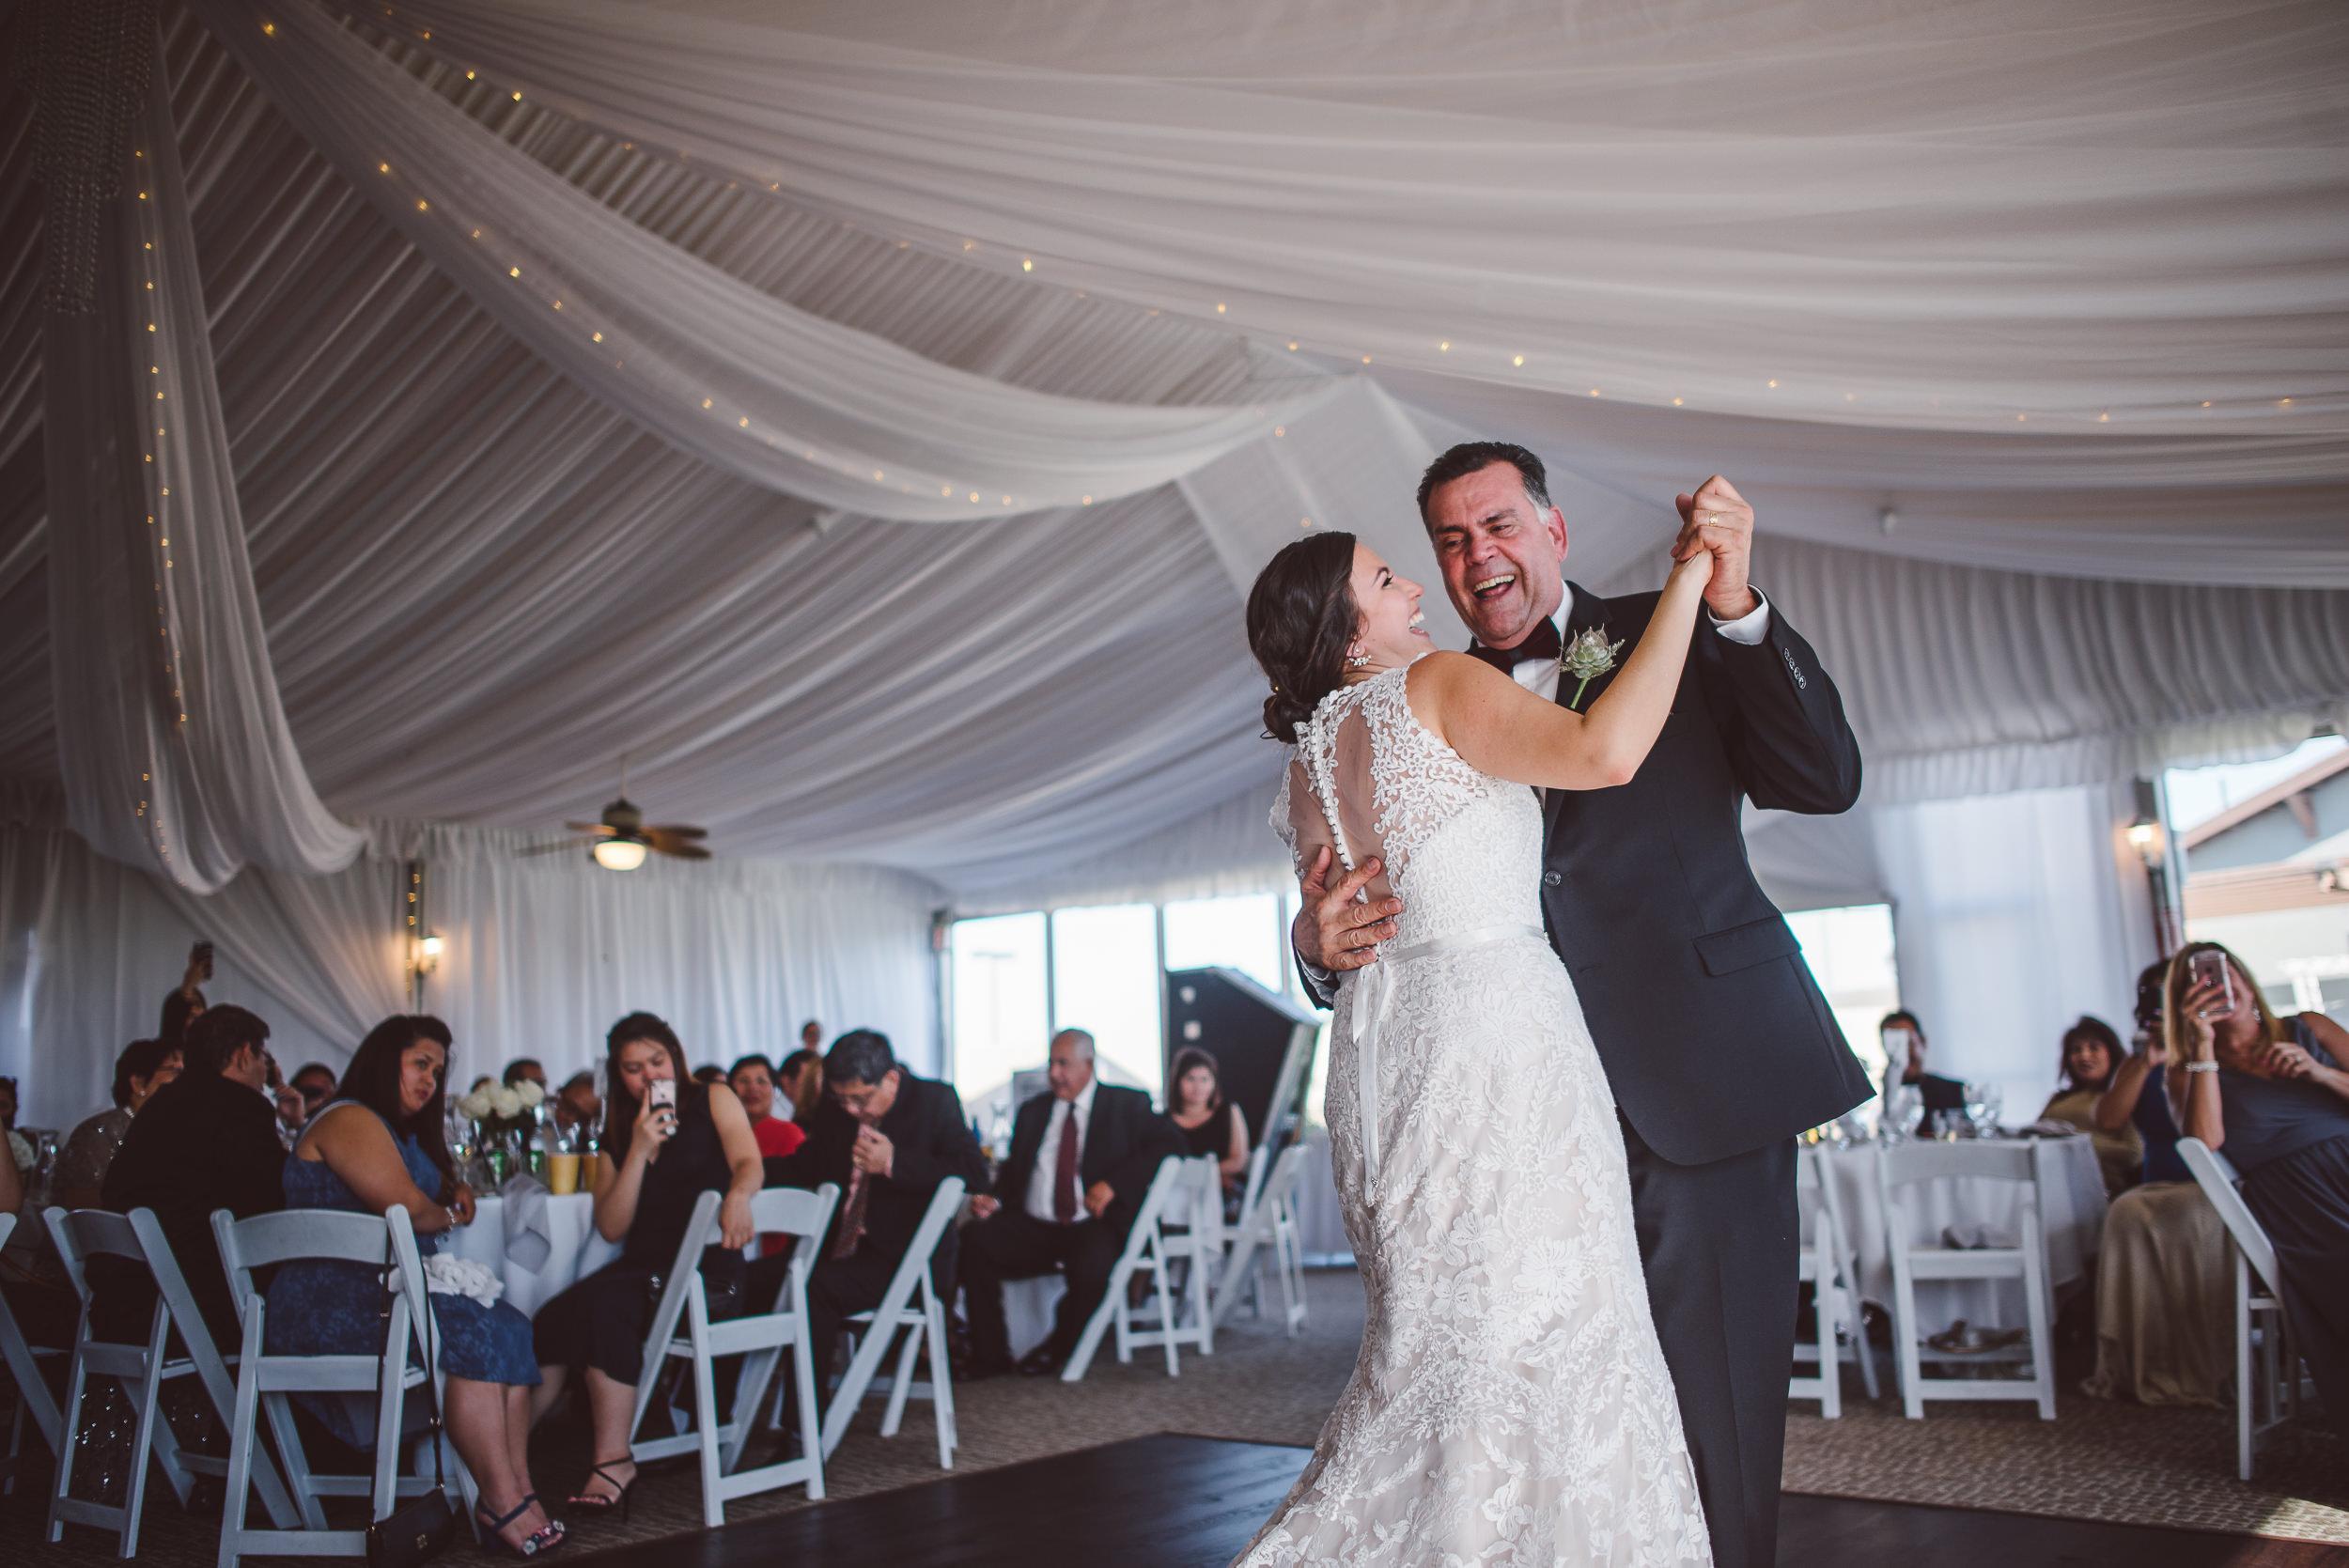 Oakland-Wedding-Photography-046.jpg